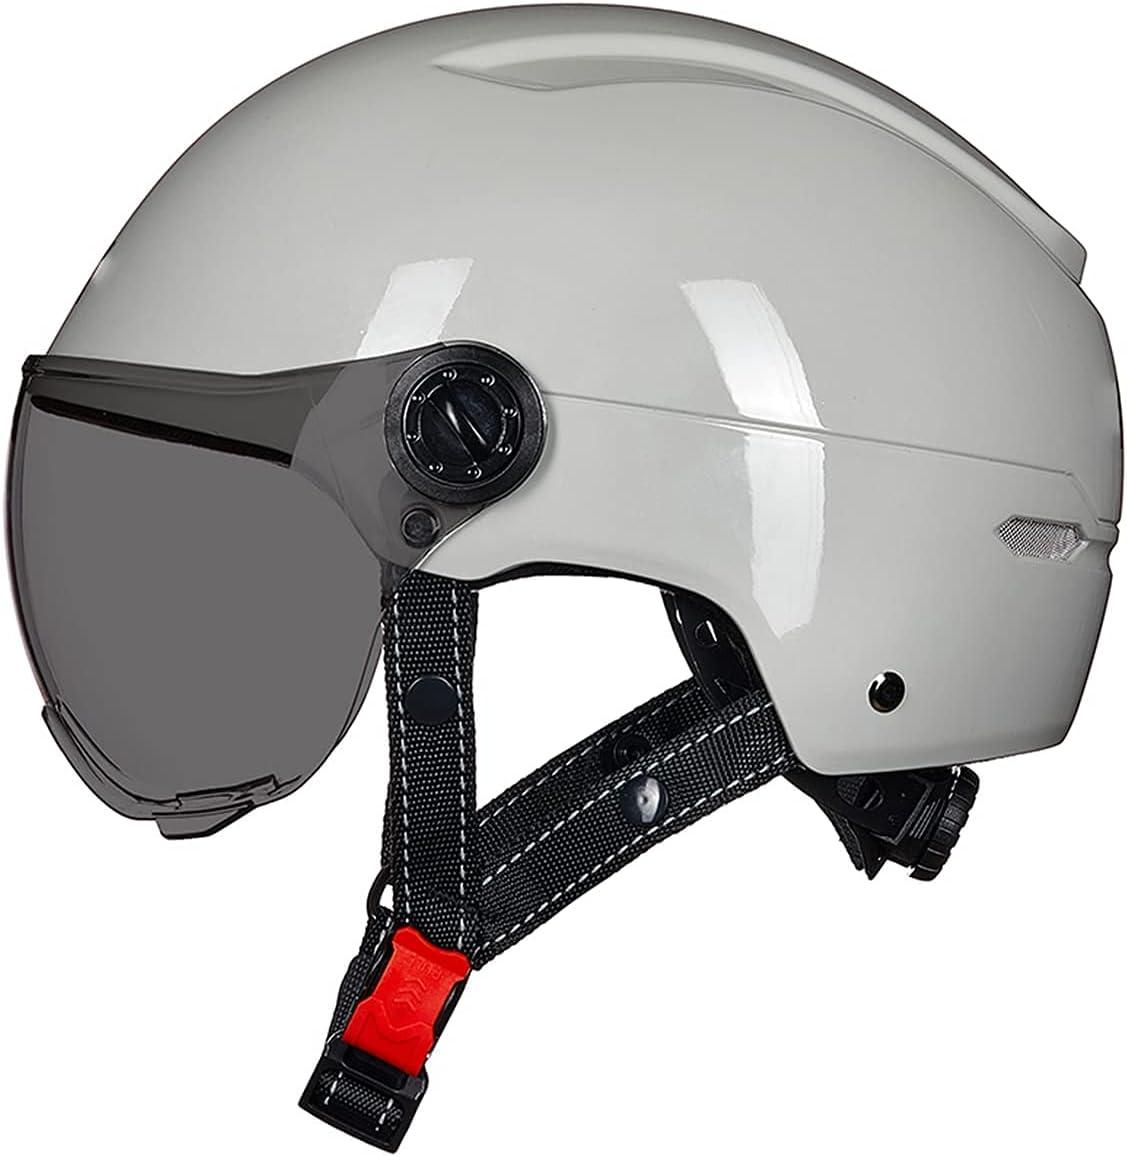 MRDAER Motocicleta Verano Retro Jet Half Cascos Motos Casco de Cara Abierta para Hombres Mujeres Gorra eléctrica con Visera aprobada por ECE/ECE (55-62cm)